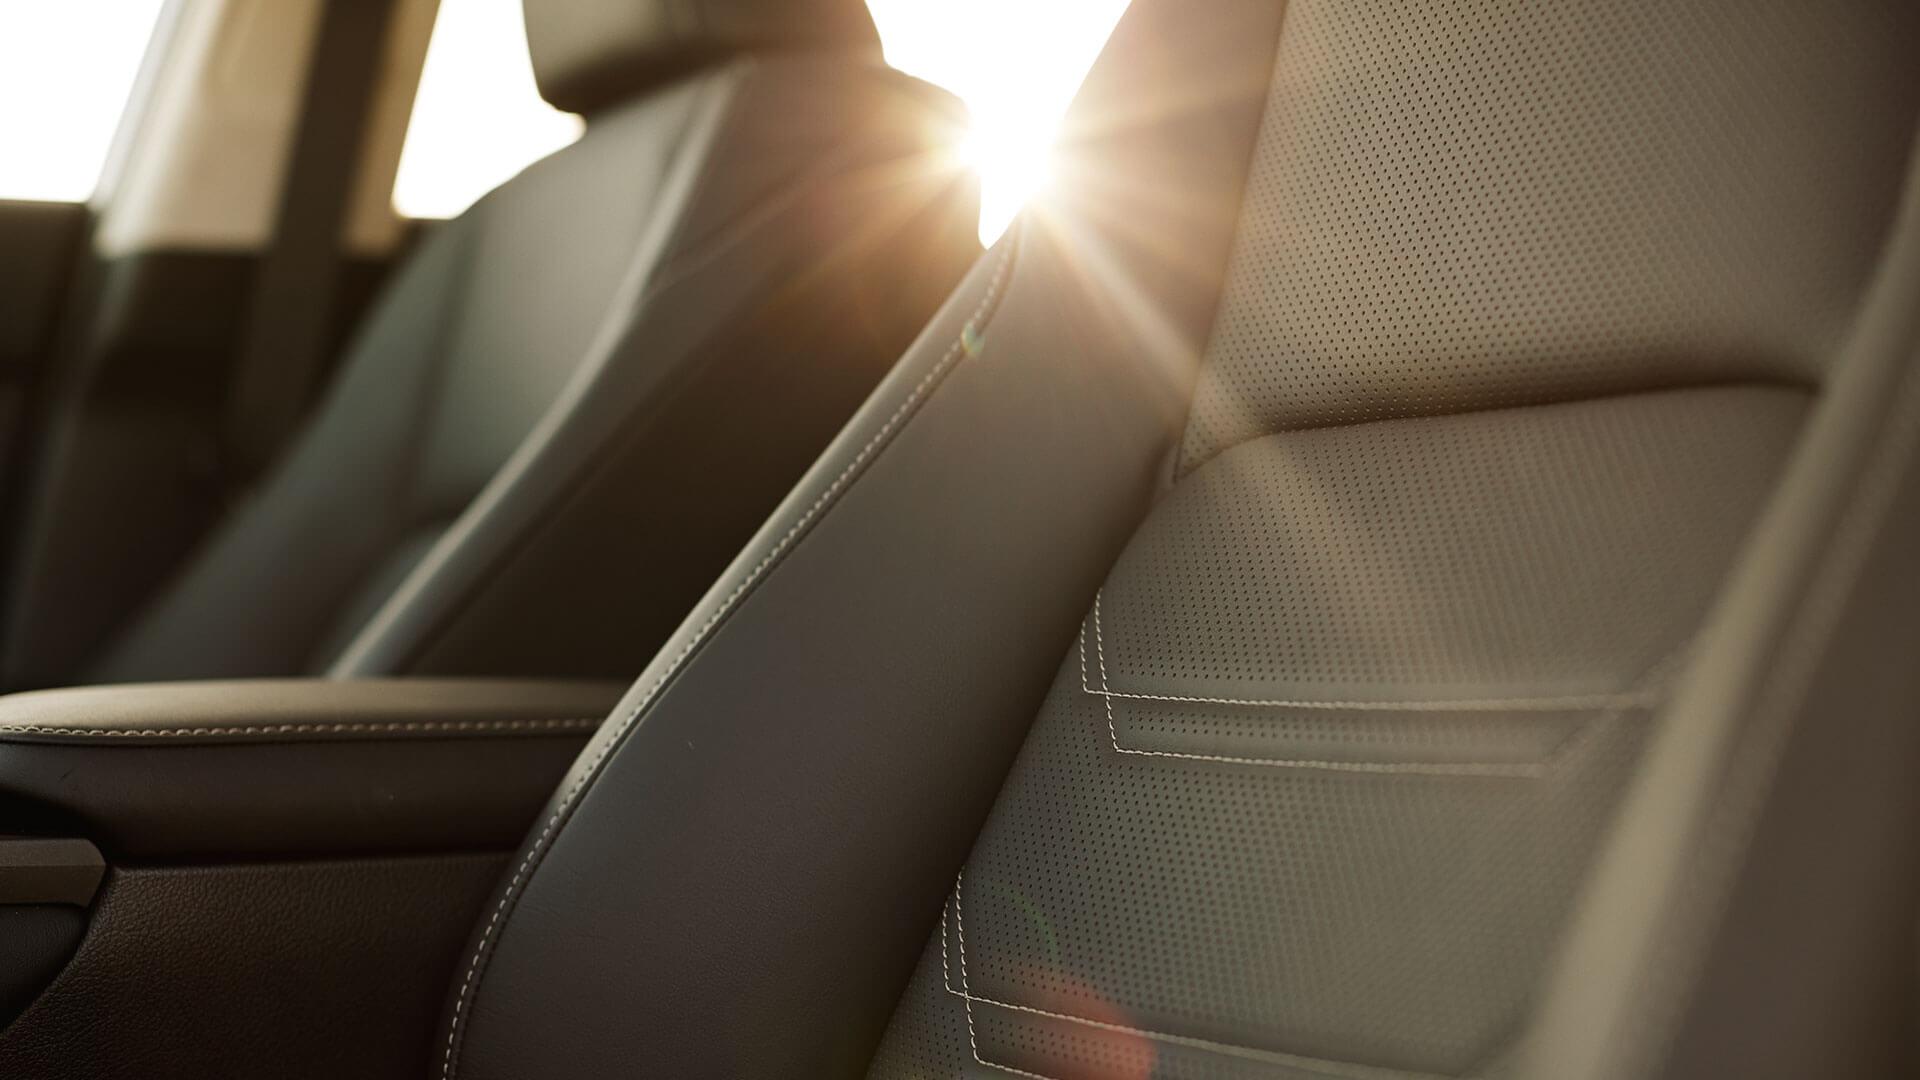 2017 lexus nx 300h features intelligent seating